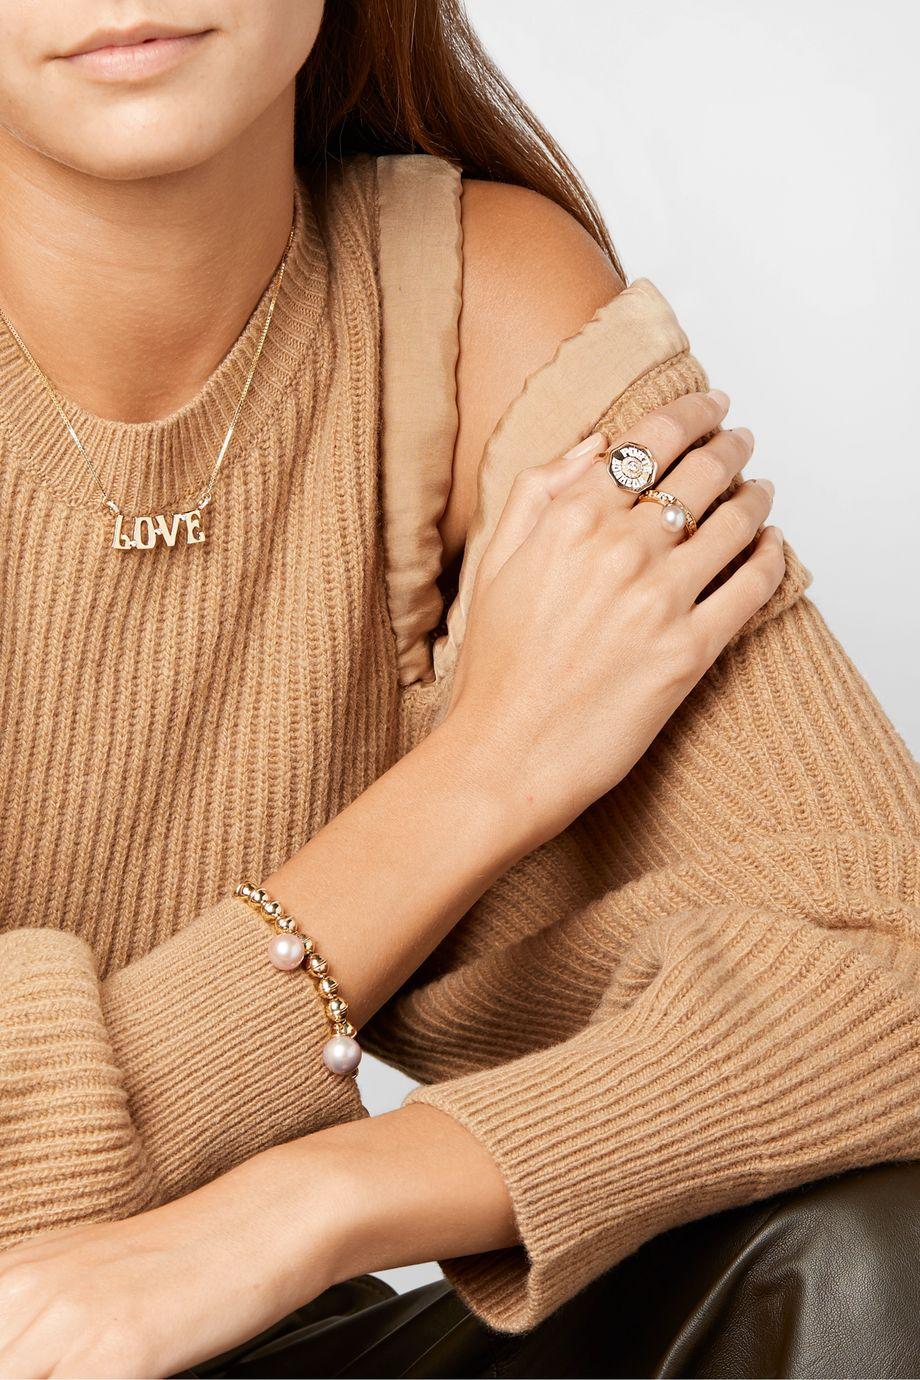 Marlo Laz Dancing 14-karat gold, pearl and diamond ring